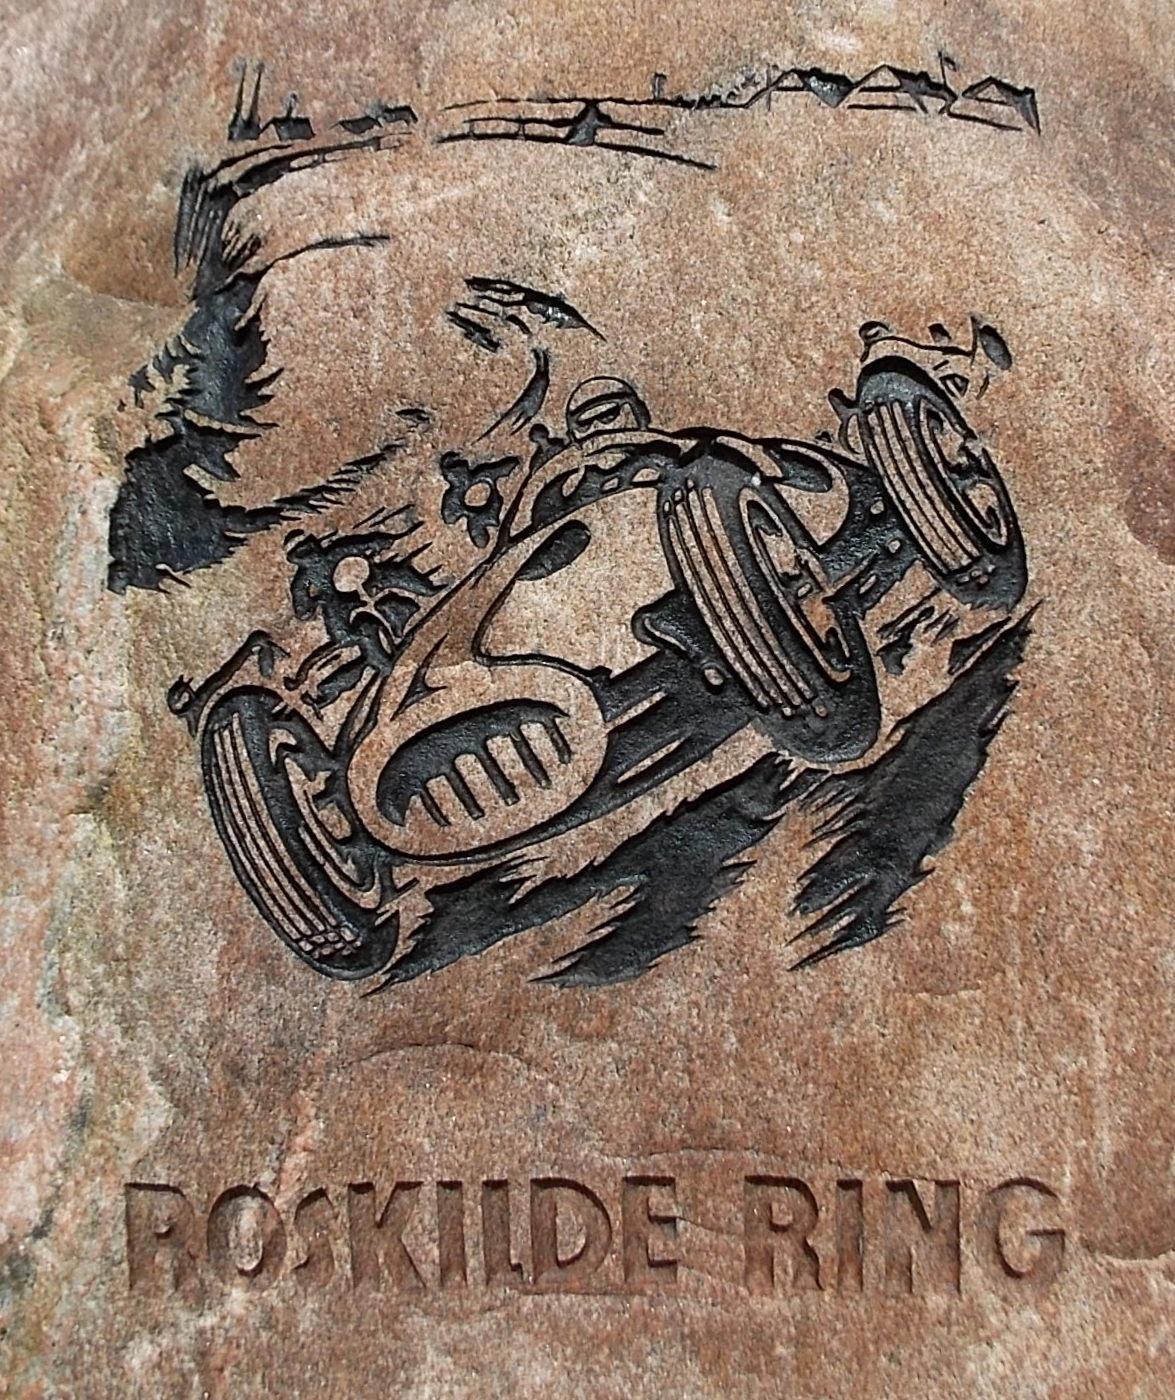 Roskilde Ring mindesten på Roskilde Ring (3)